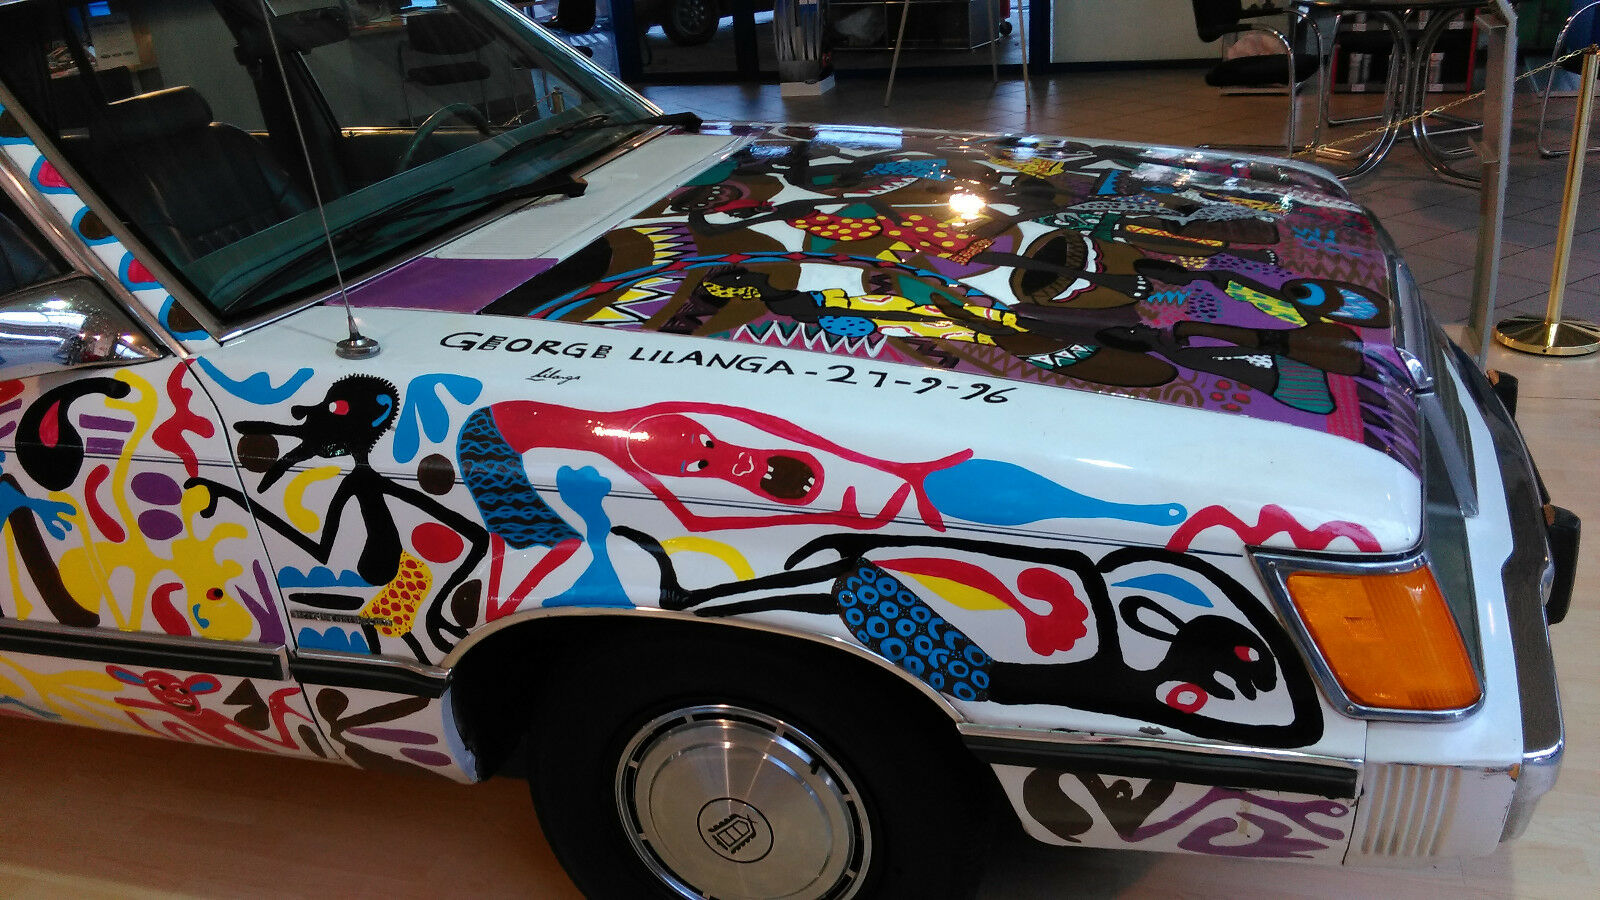 Ford LTD Station Wagon Car art George Lilanga (15)